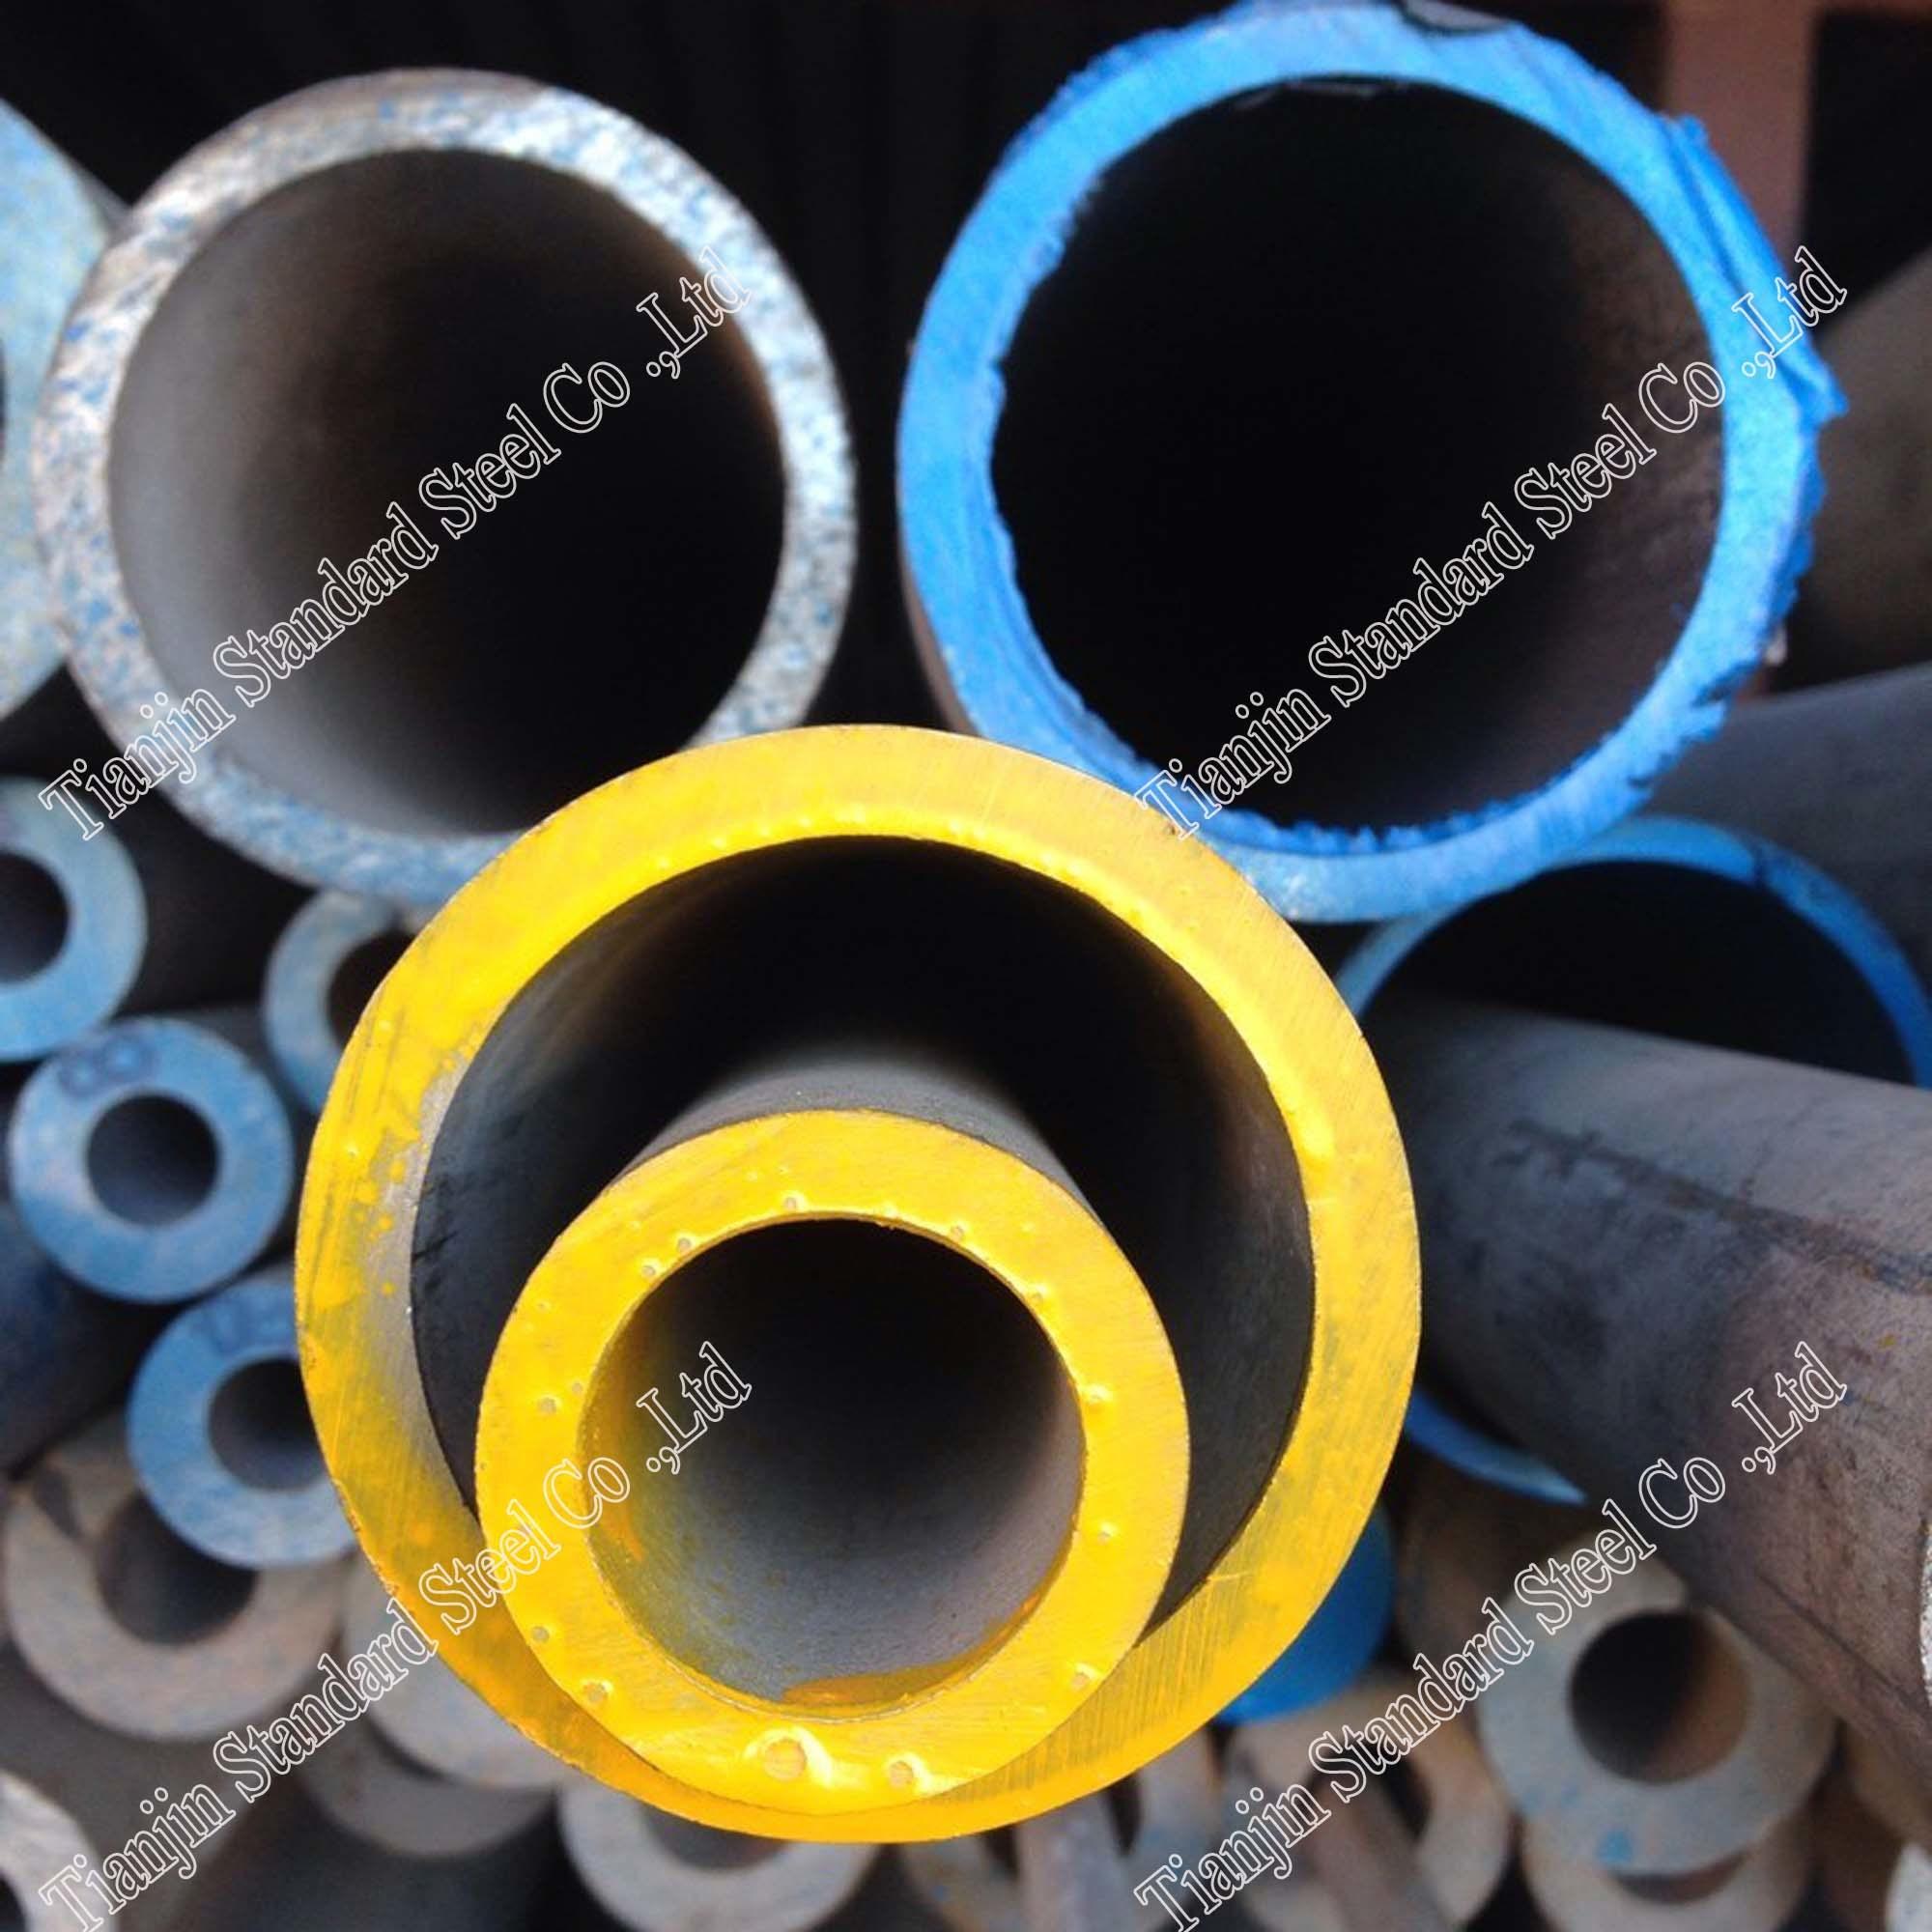 Tubo tubo de acero inoxidable 304l 304 316l 321 310 310s - Tubos de acero inoxidable ...